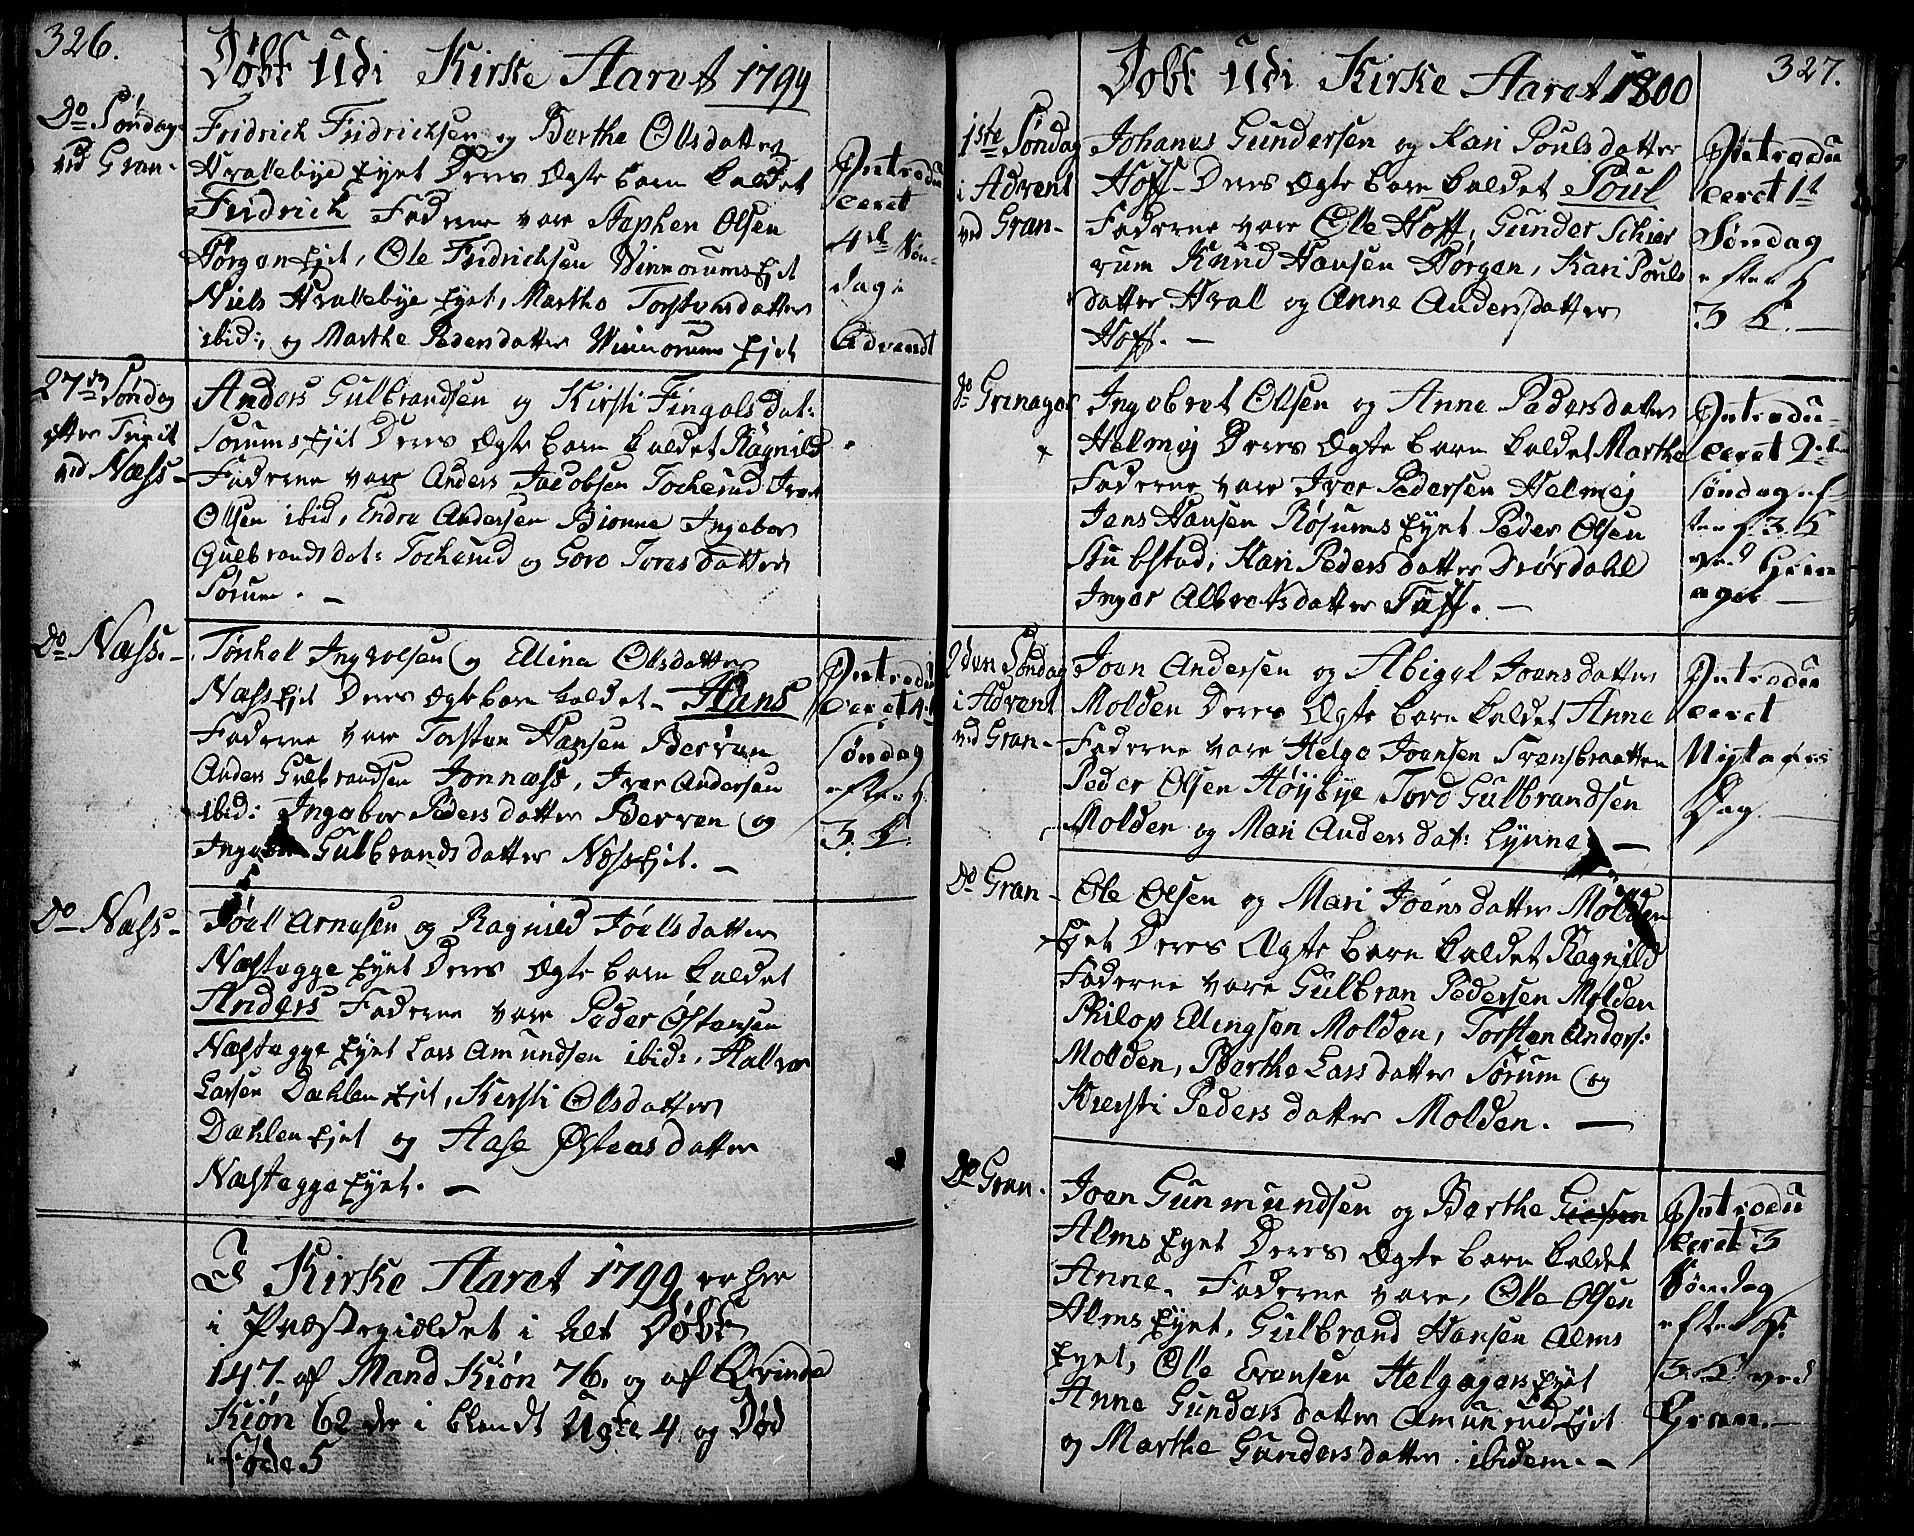 SAH, Gran prestekontor, Ministerialbok nr. 6, 1787-1824, s. 326-327